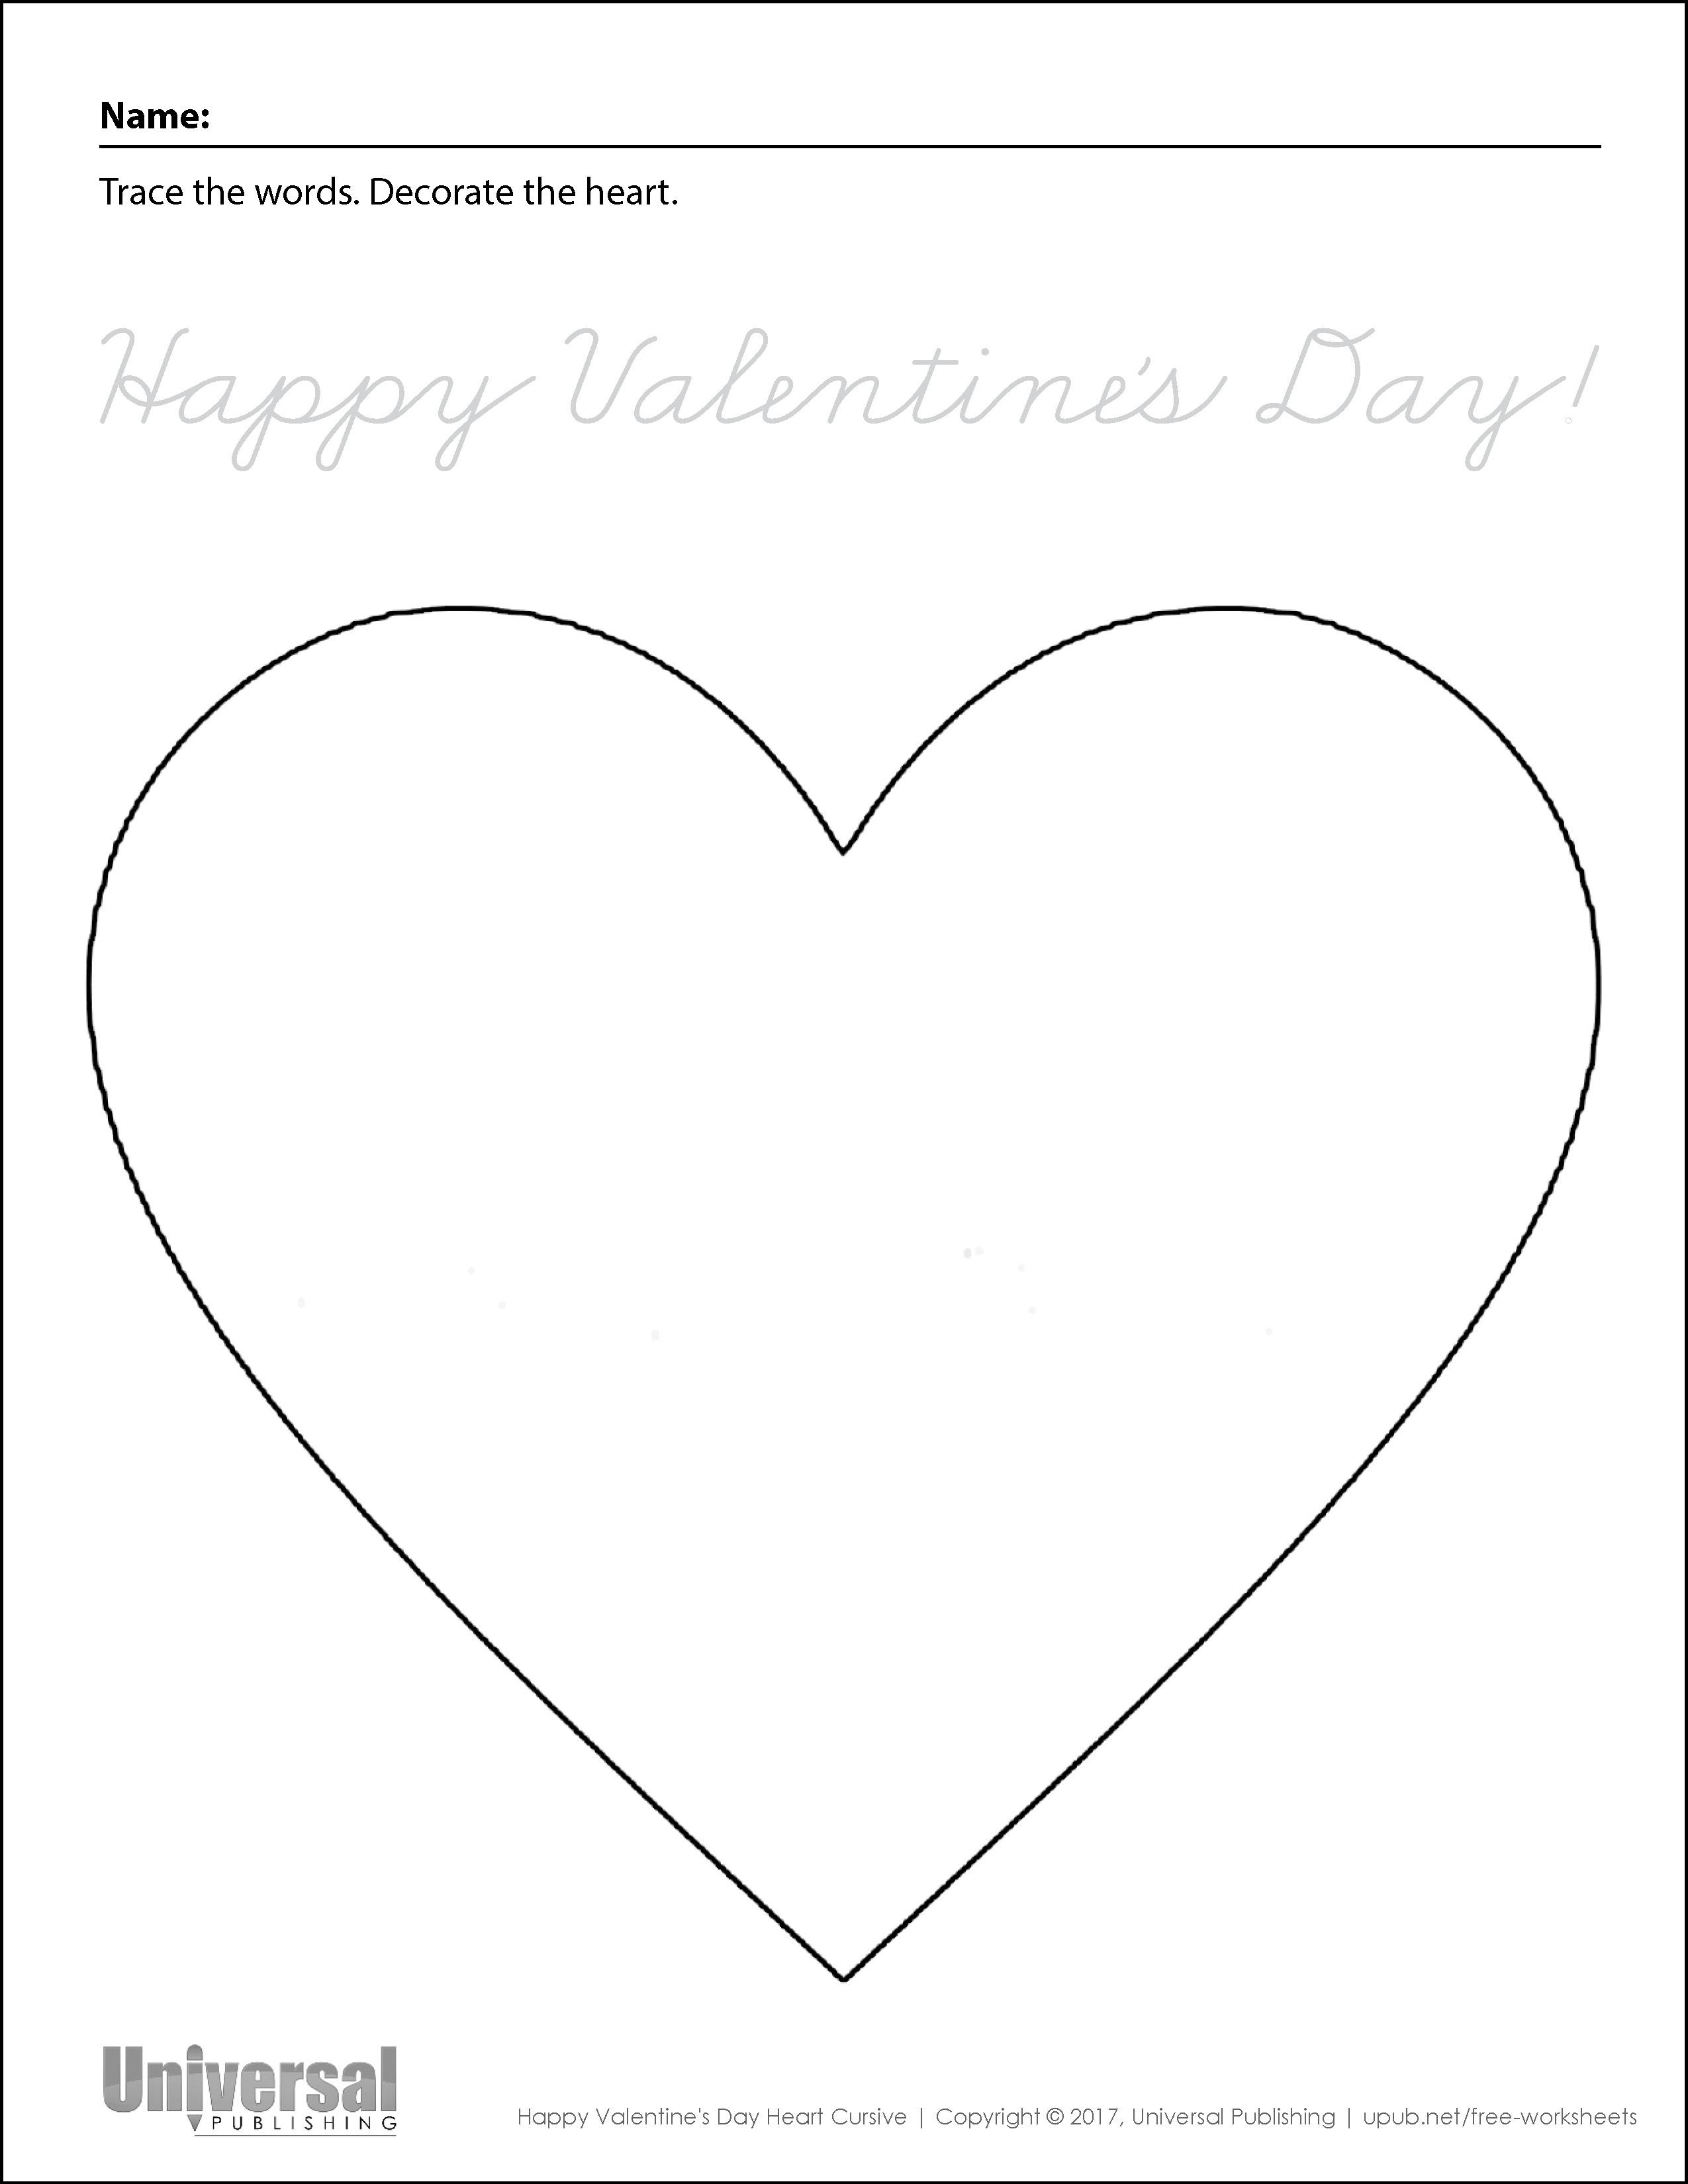 Happy Valentine's Day Heart Cursive